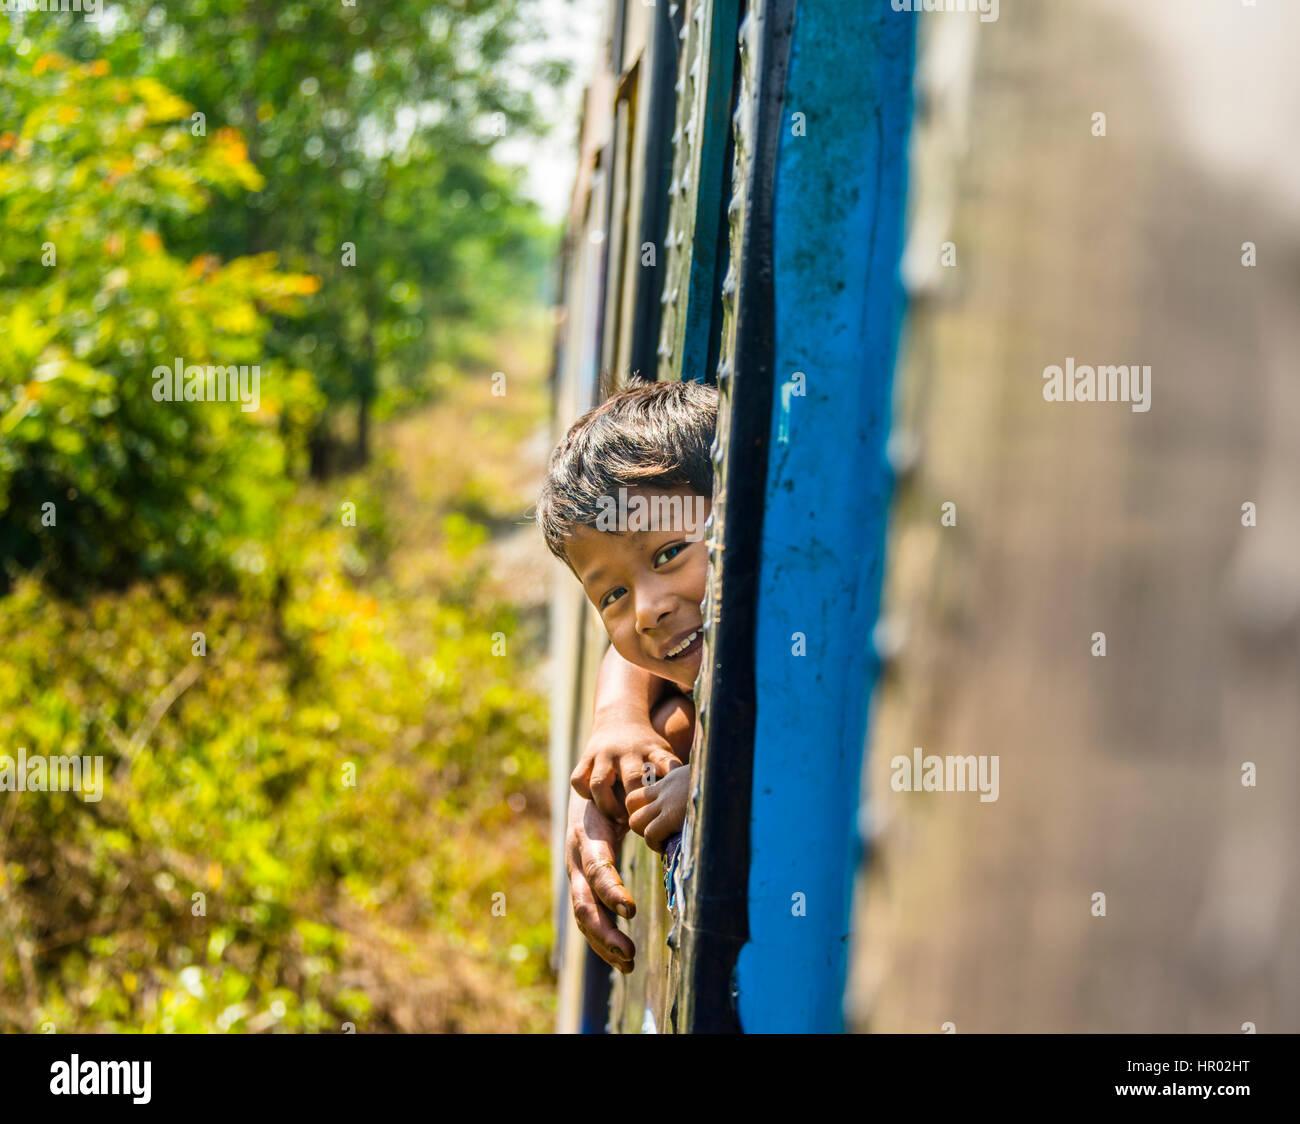 Small local boy looking out of moving train, Yangon Circular Railway, Yangon, Myanmar - Stock Image